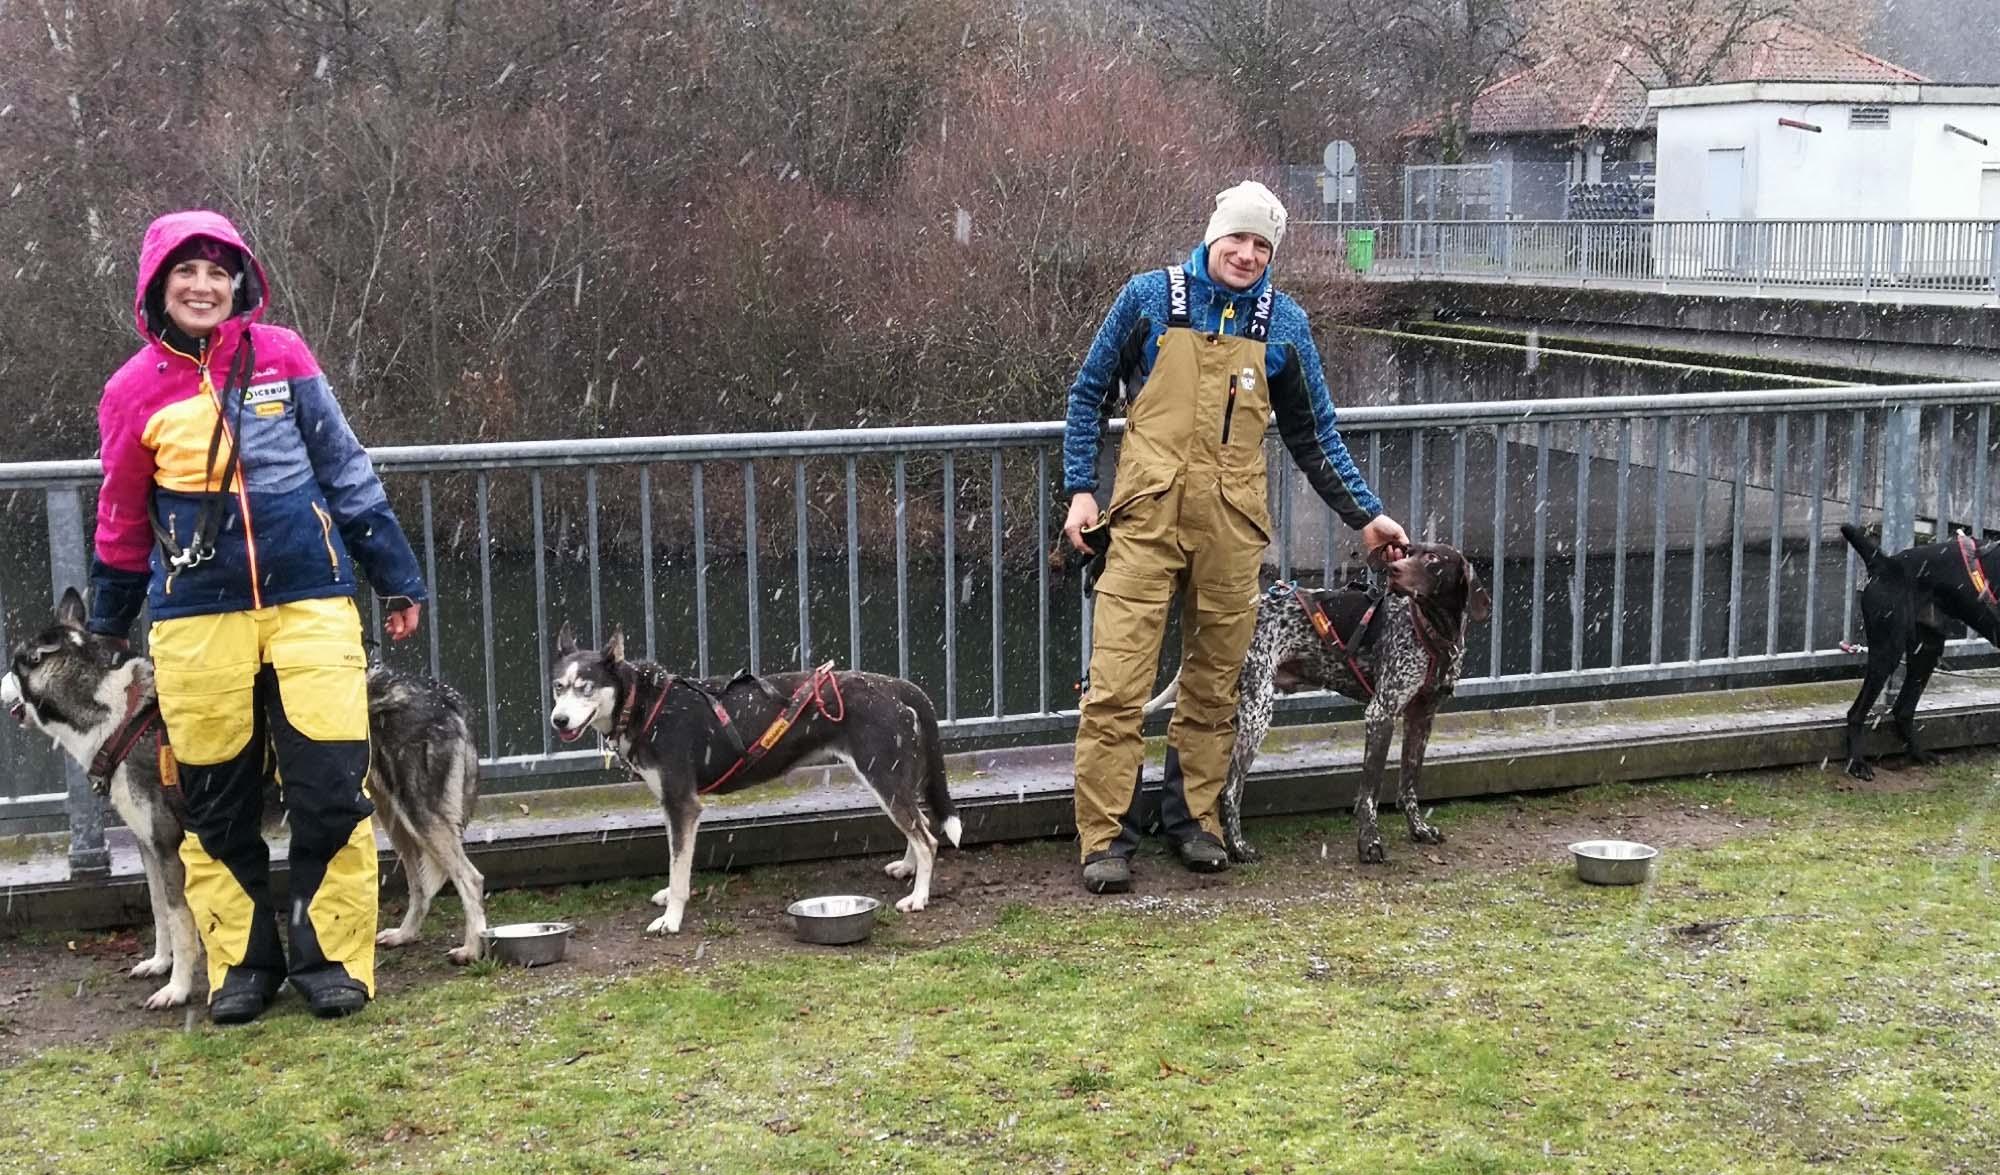 2021-1-29-Kinzigtal-Hansjörg Wörner-Hundeschlitten-IMG_20201231_104724